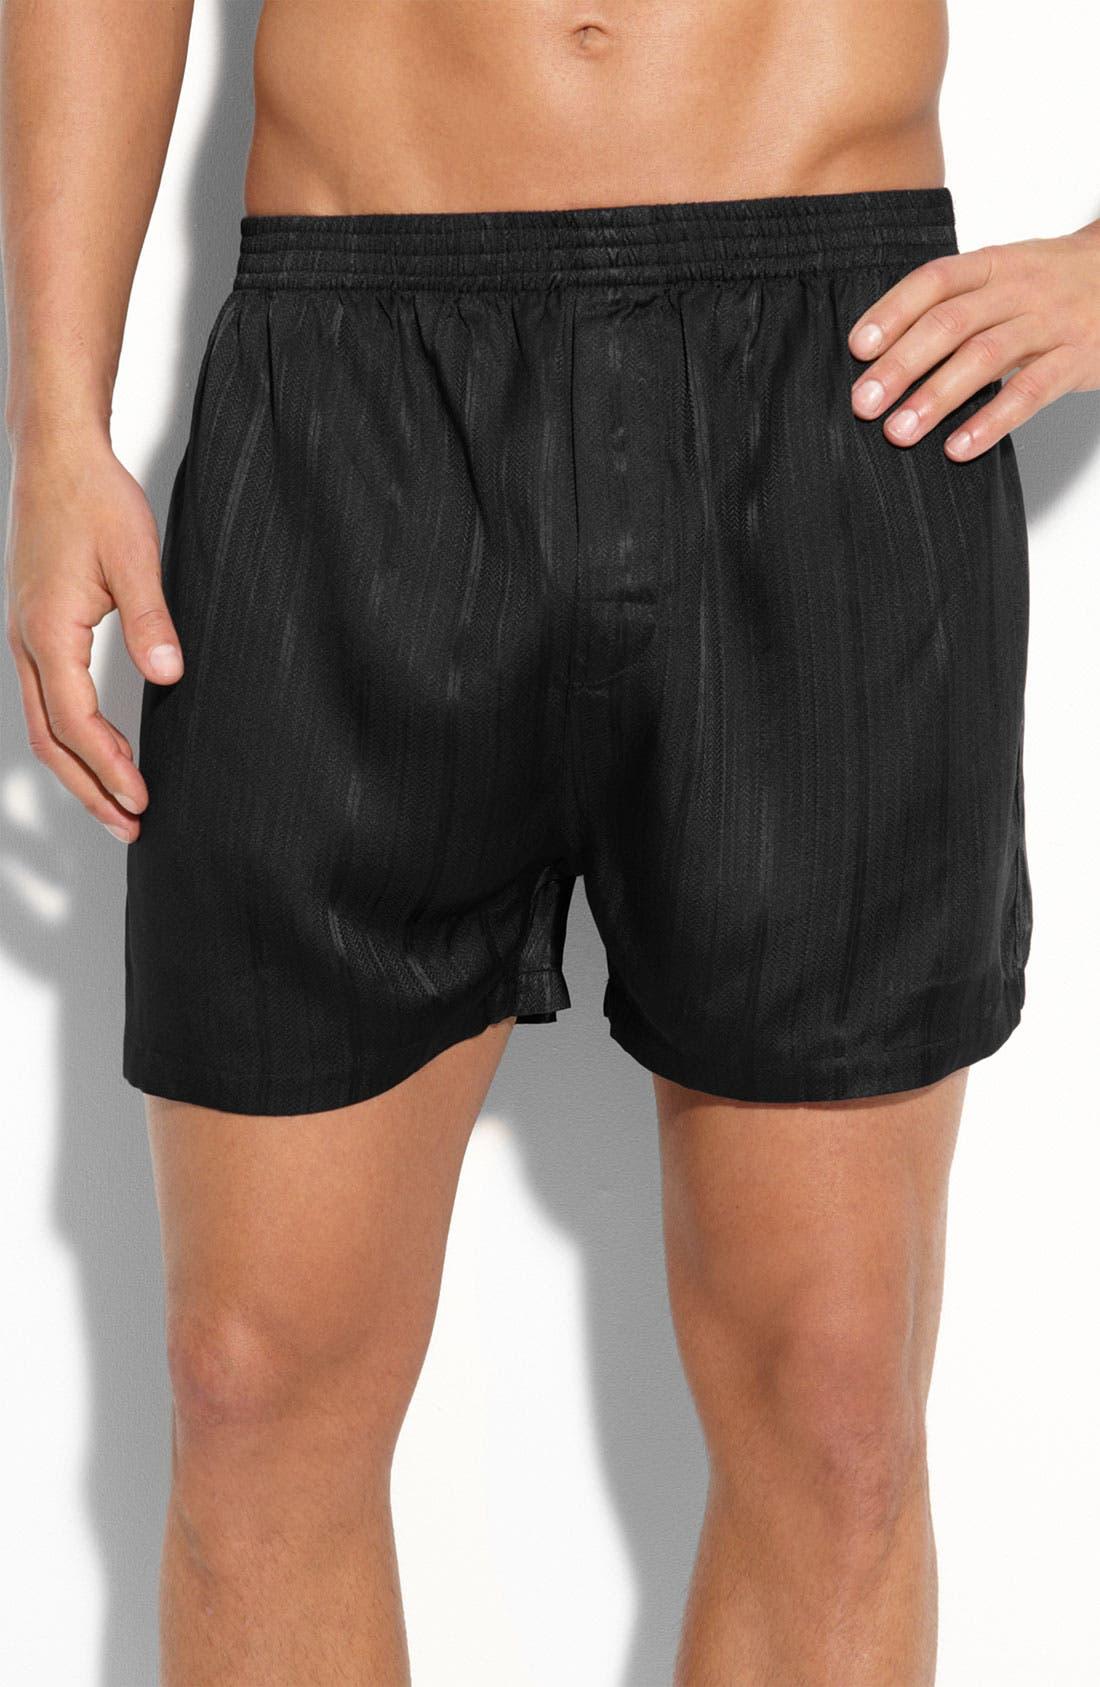 Alternate Image 1 Selected - Majestic International Herringbone Stripe Silk Boxer Shorts